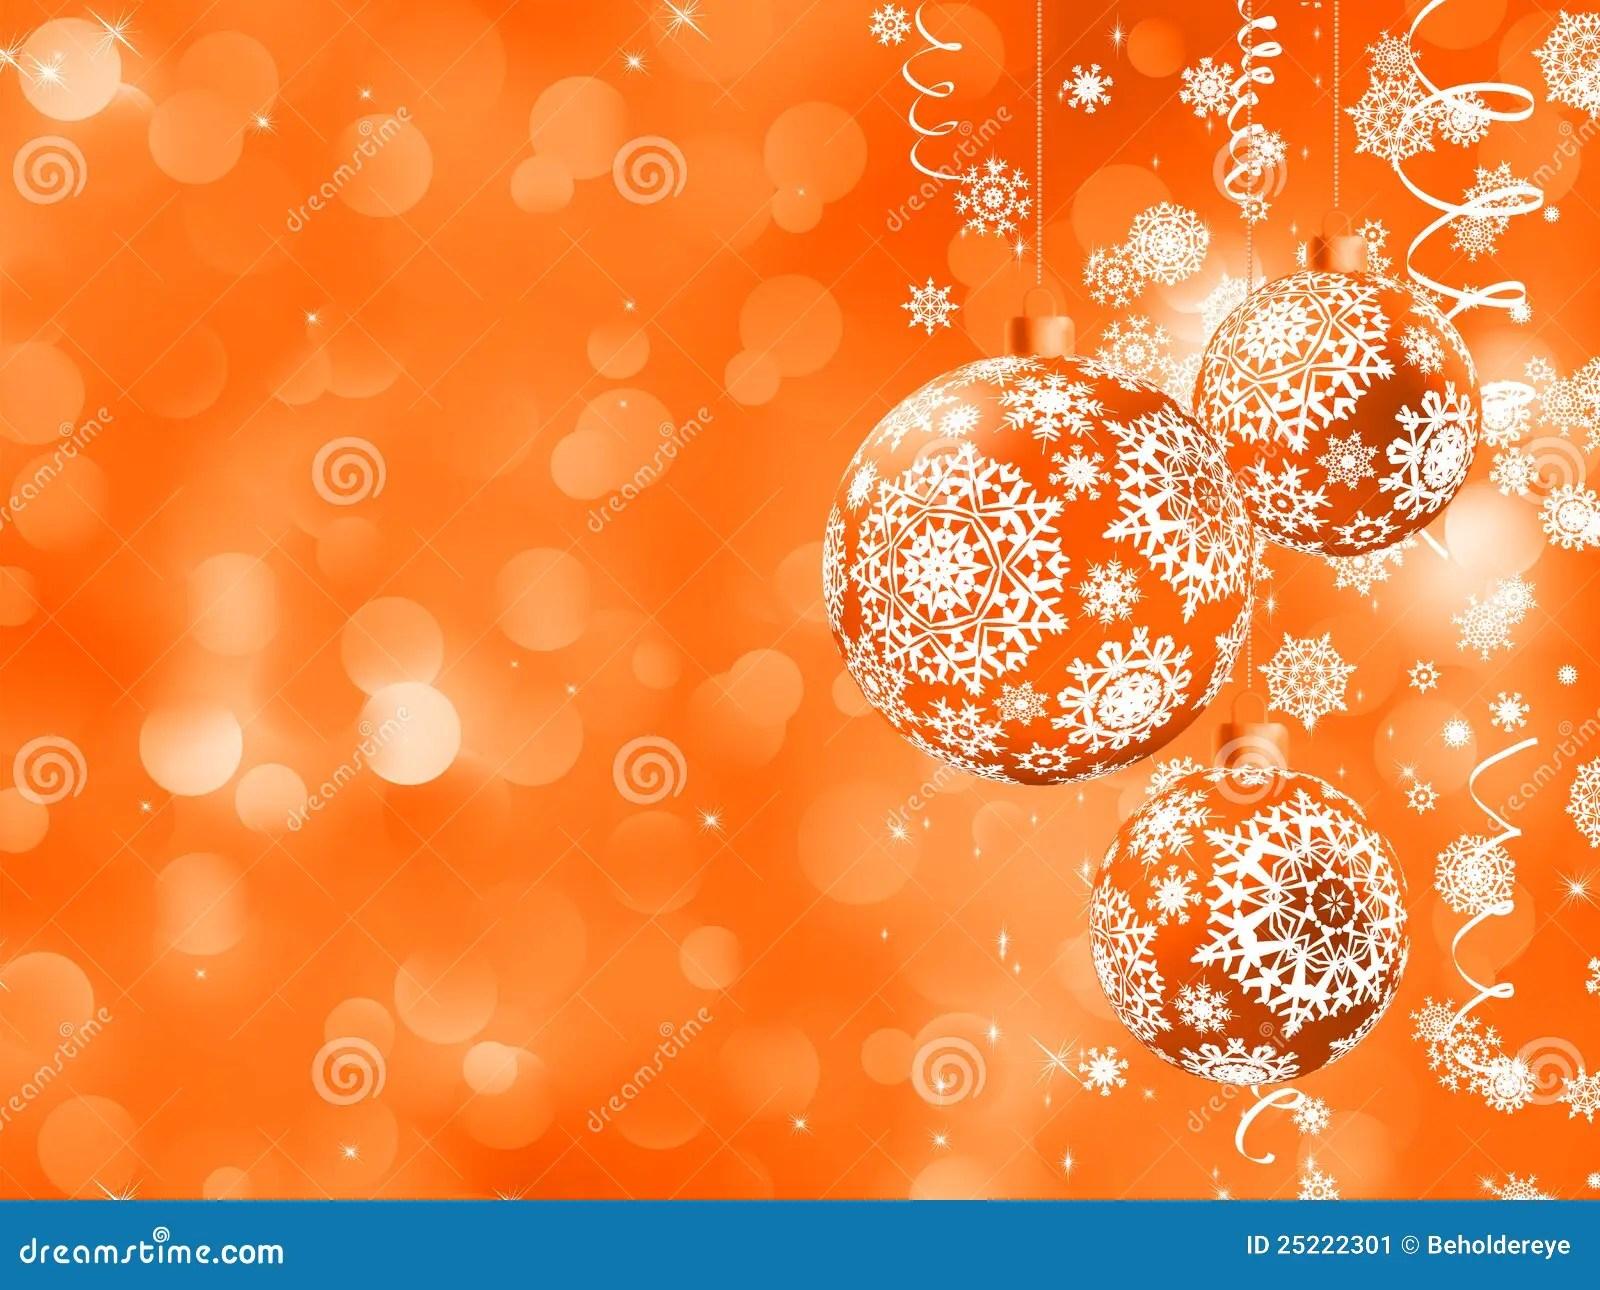 Christmas Orange Background With Snowflakes EPS 8 Stock